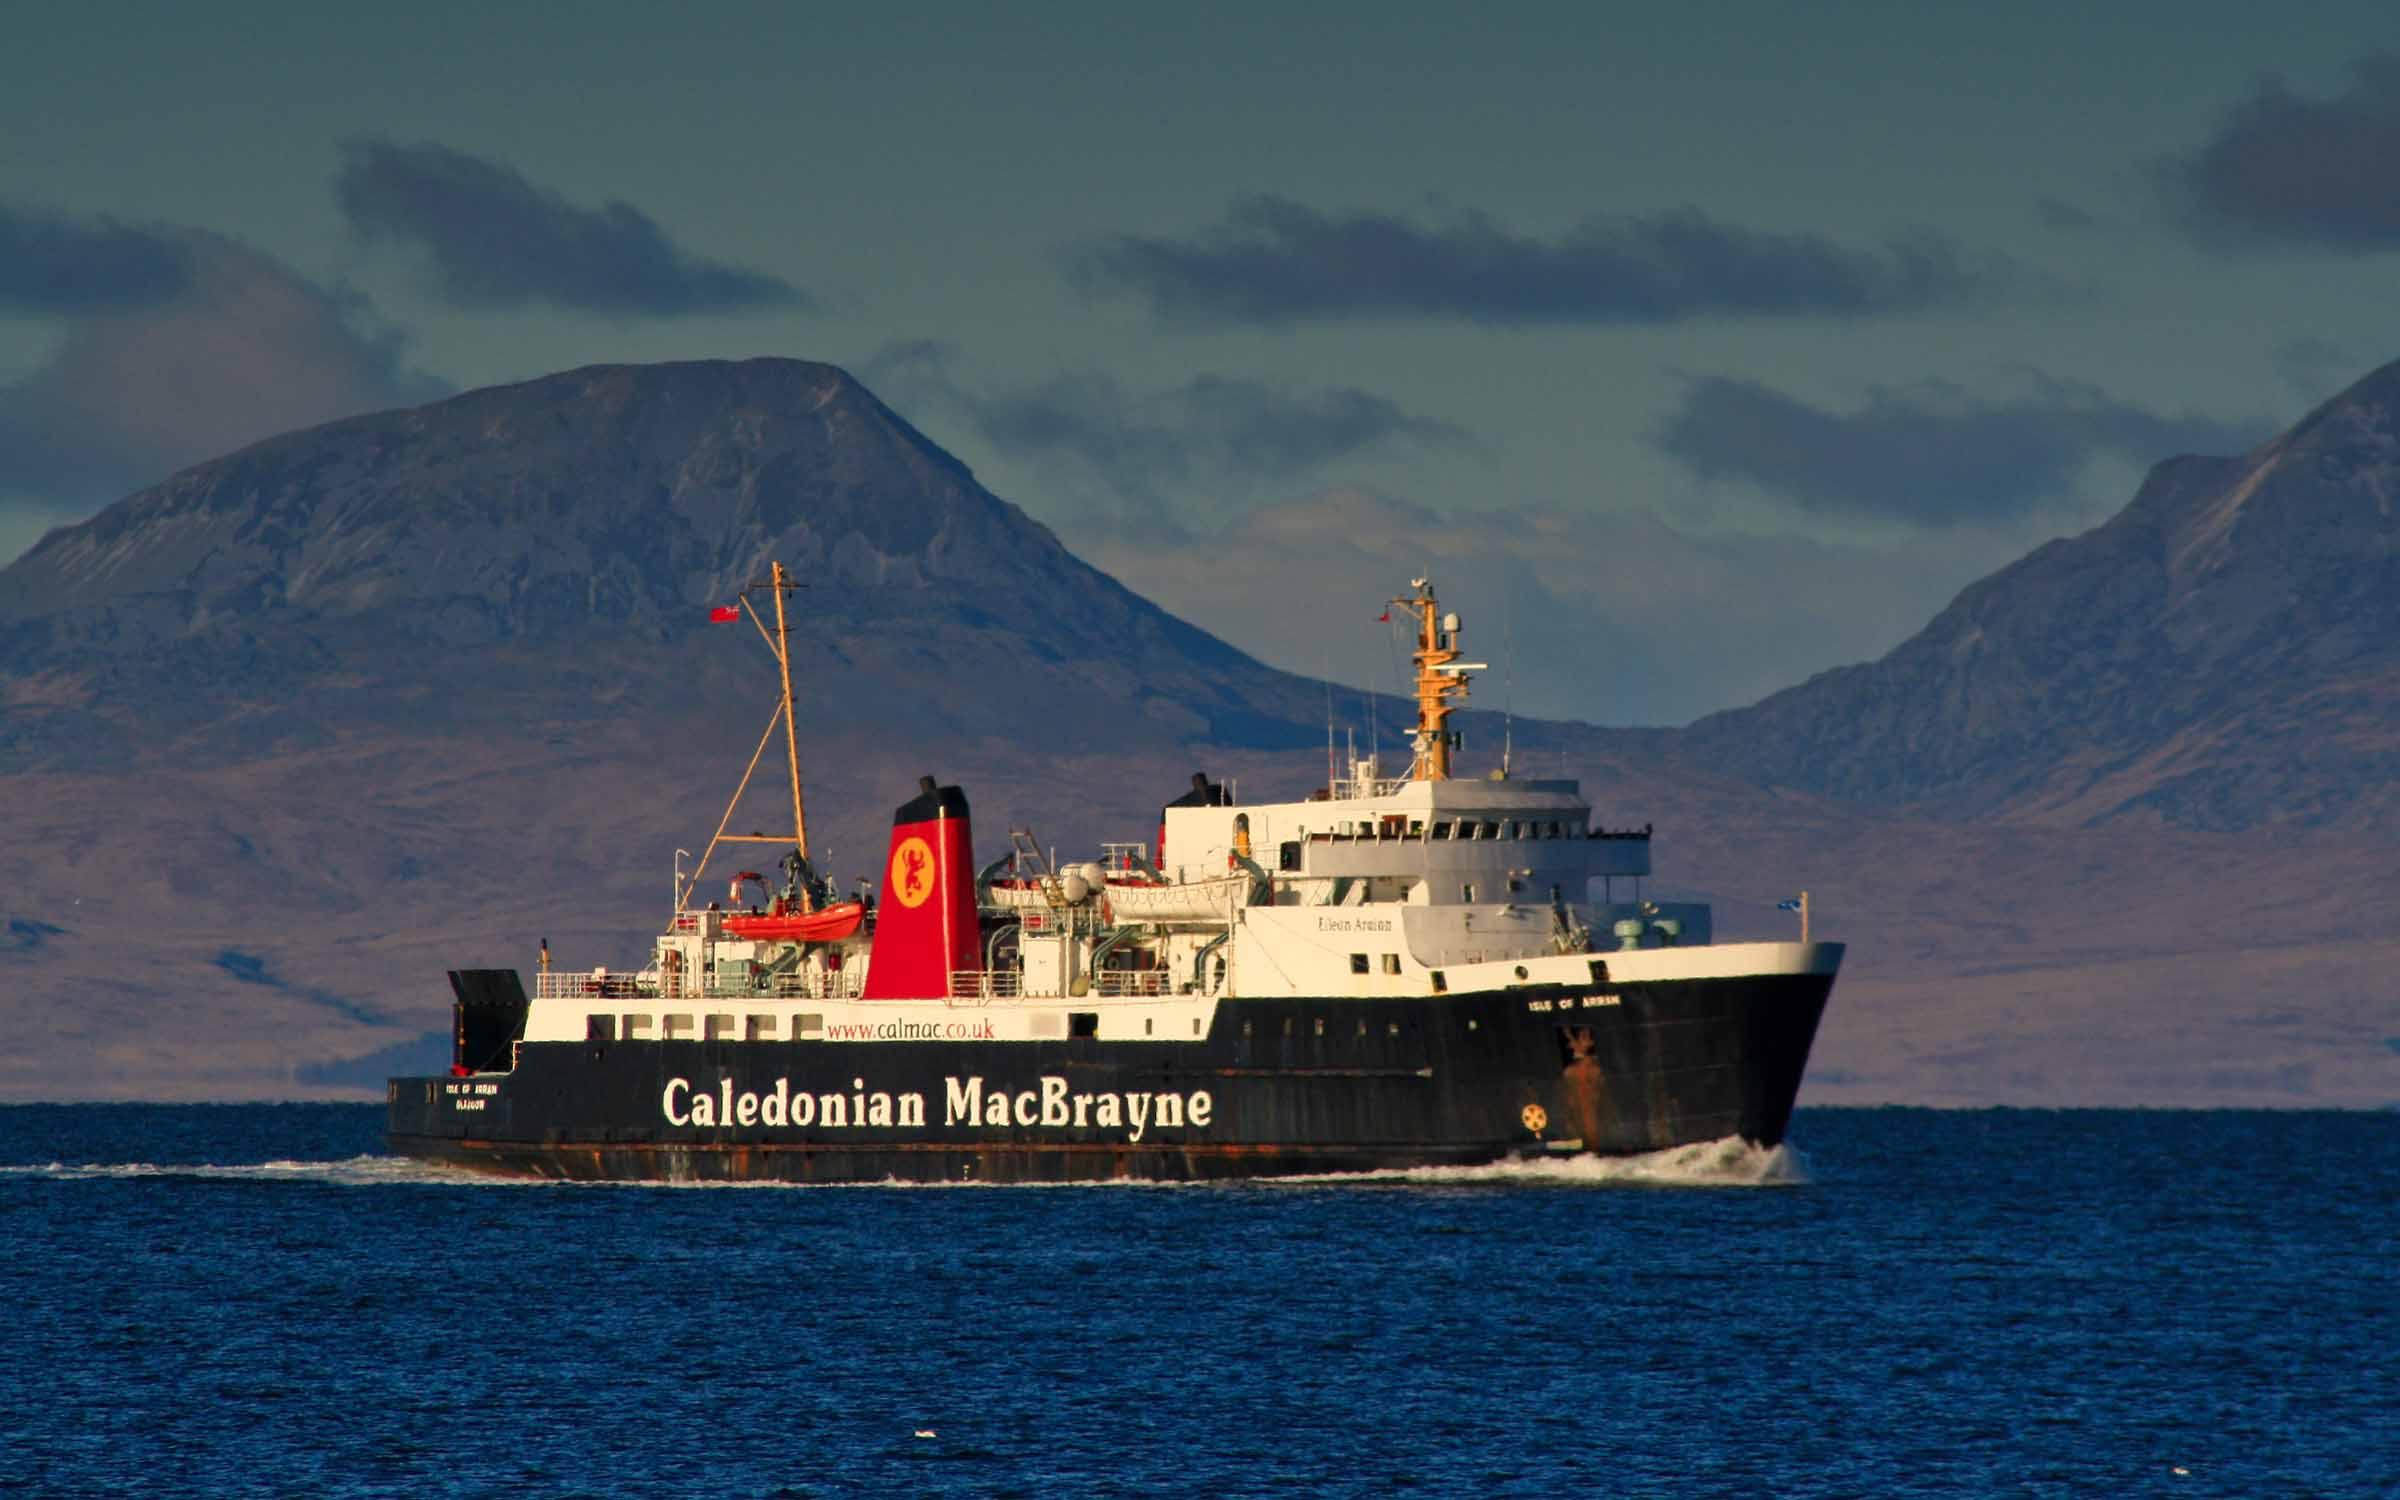 Isle of Arran inbound to Kennacraig (Ships of CalMac)